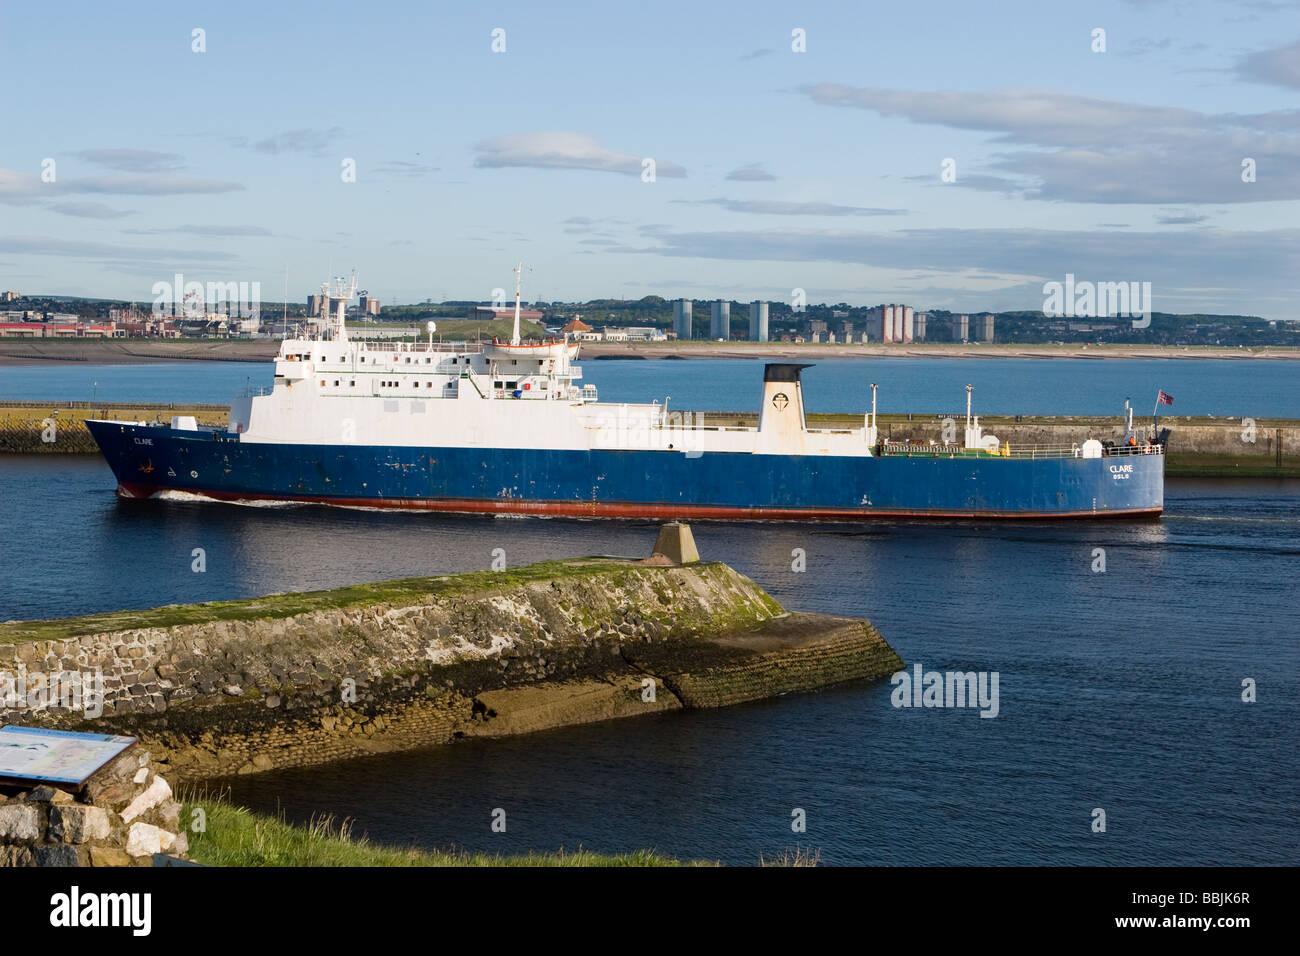 Aberdeen Ferry - Stock Image